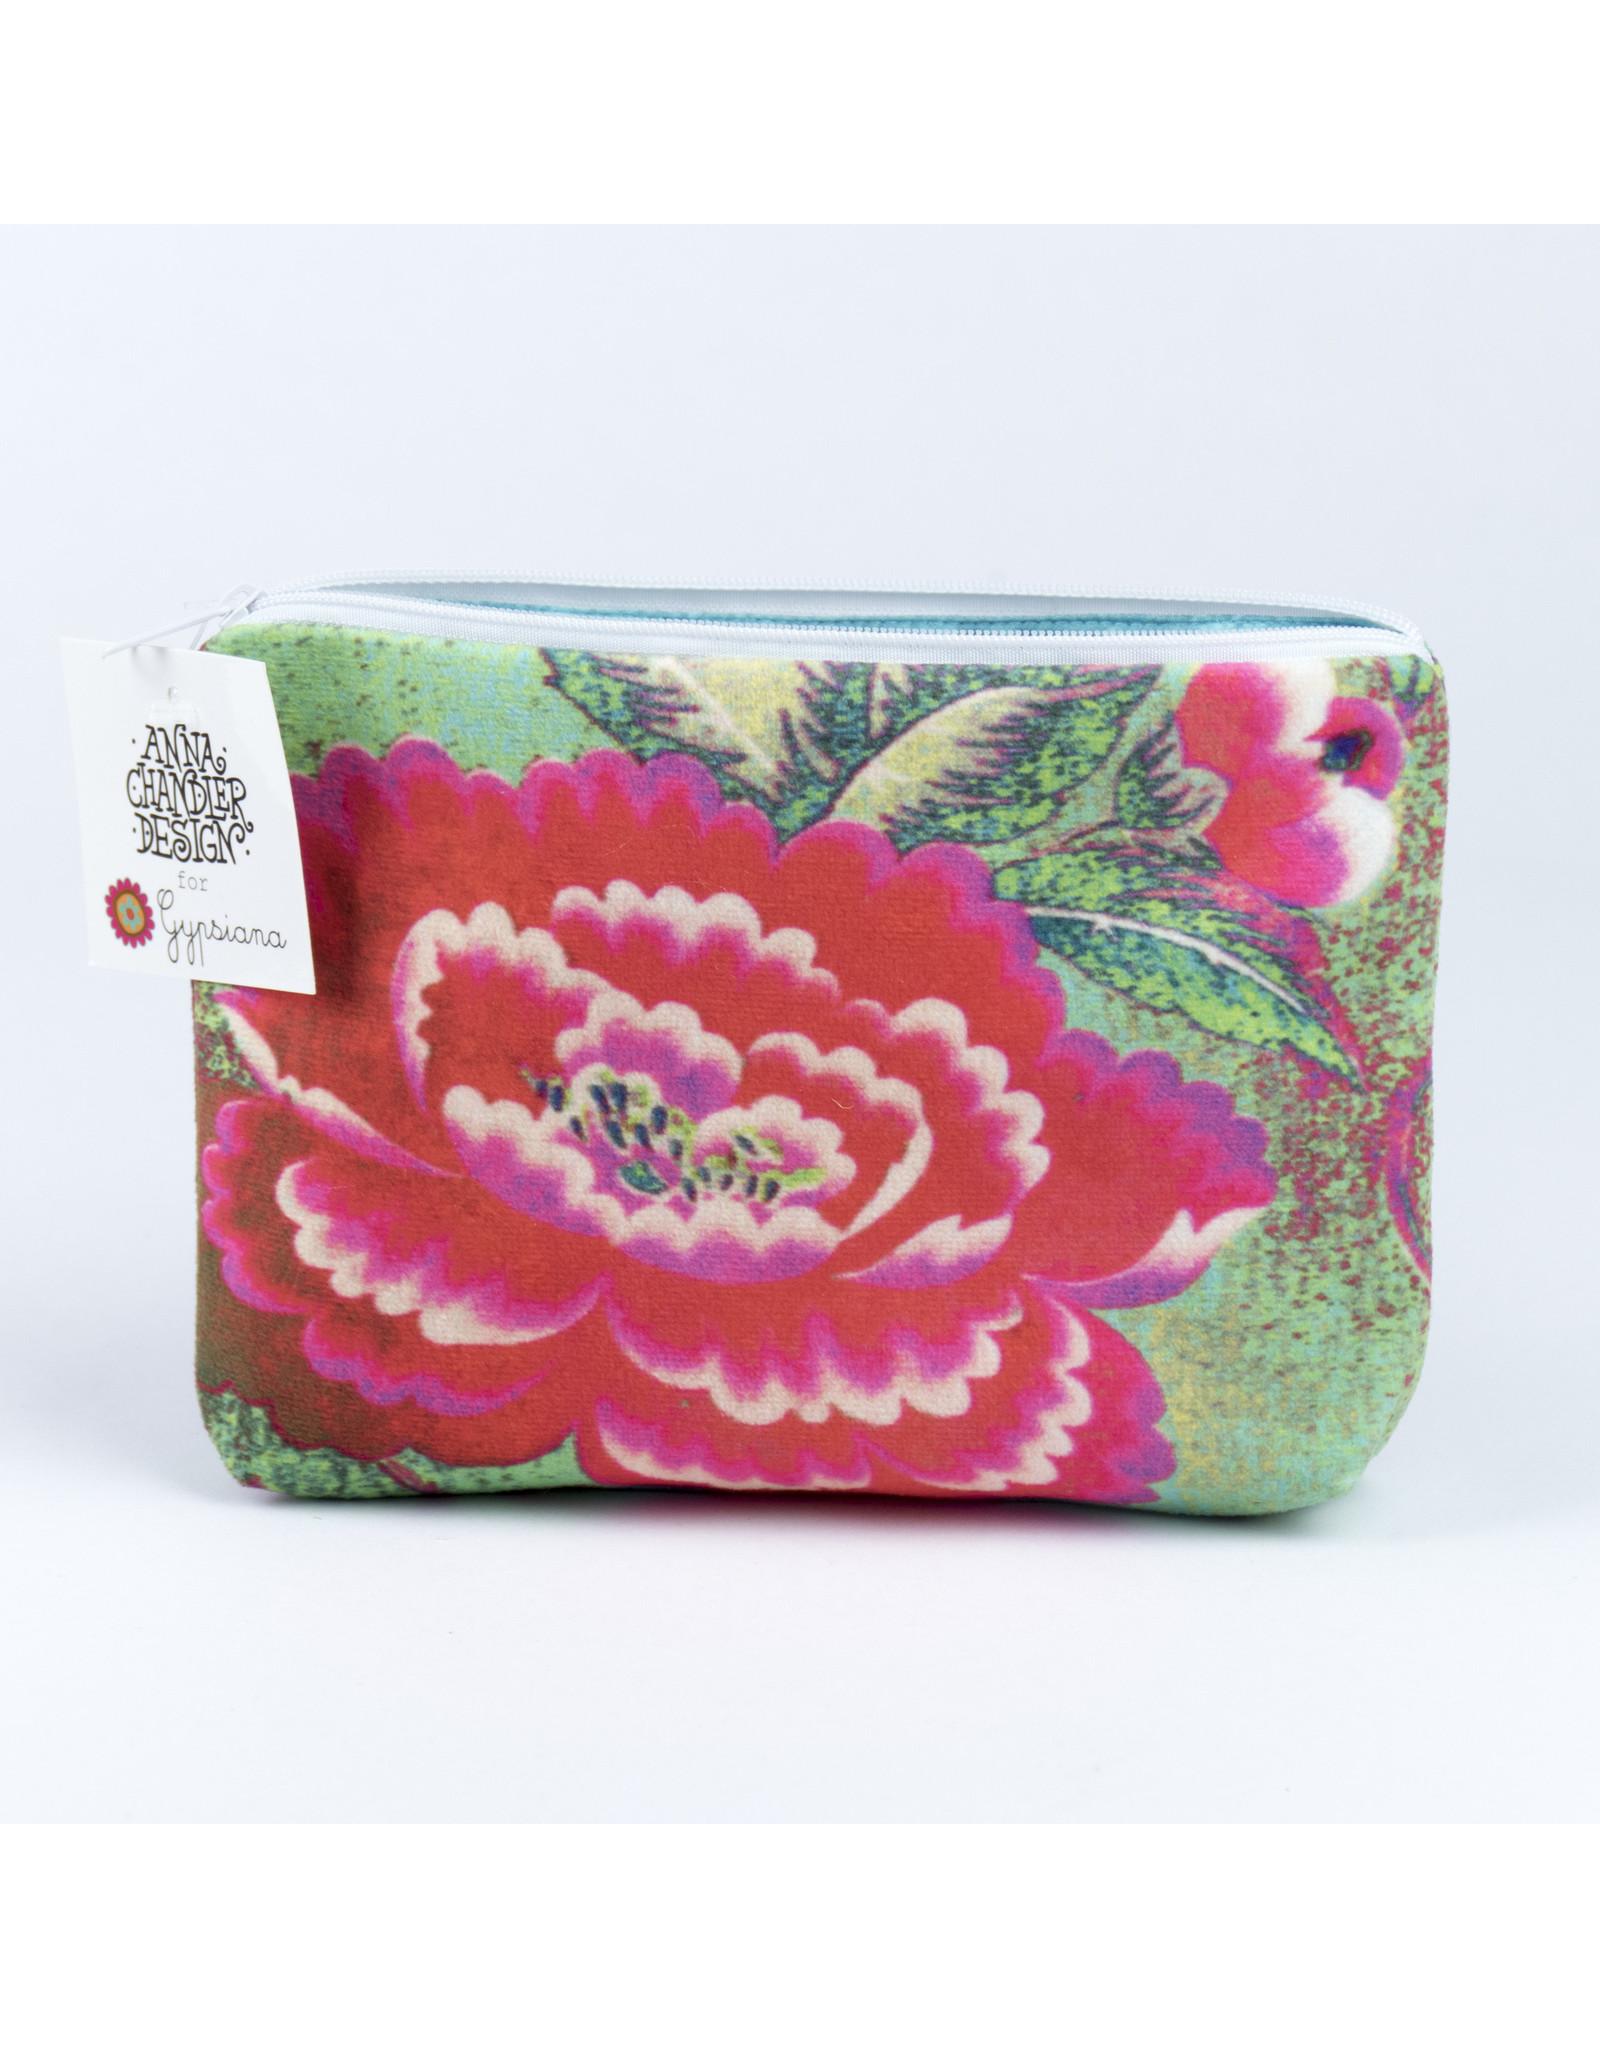 Anna Chandler Design Velvet Purse Chinese Peony